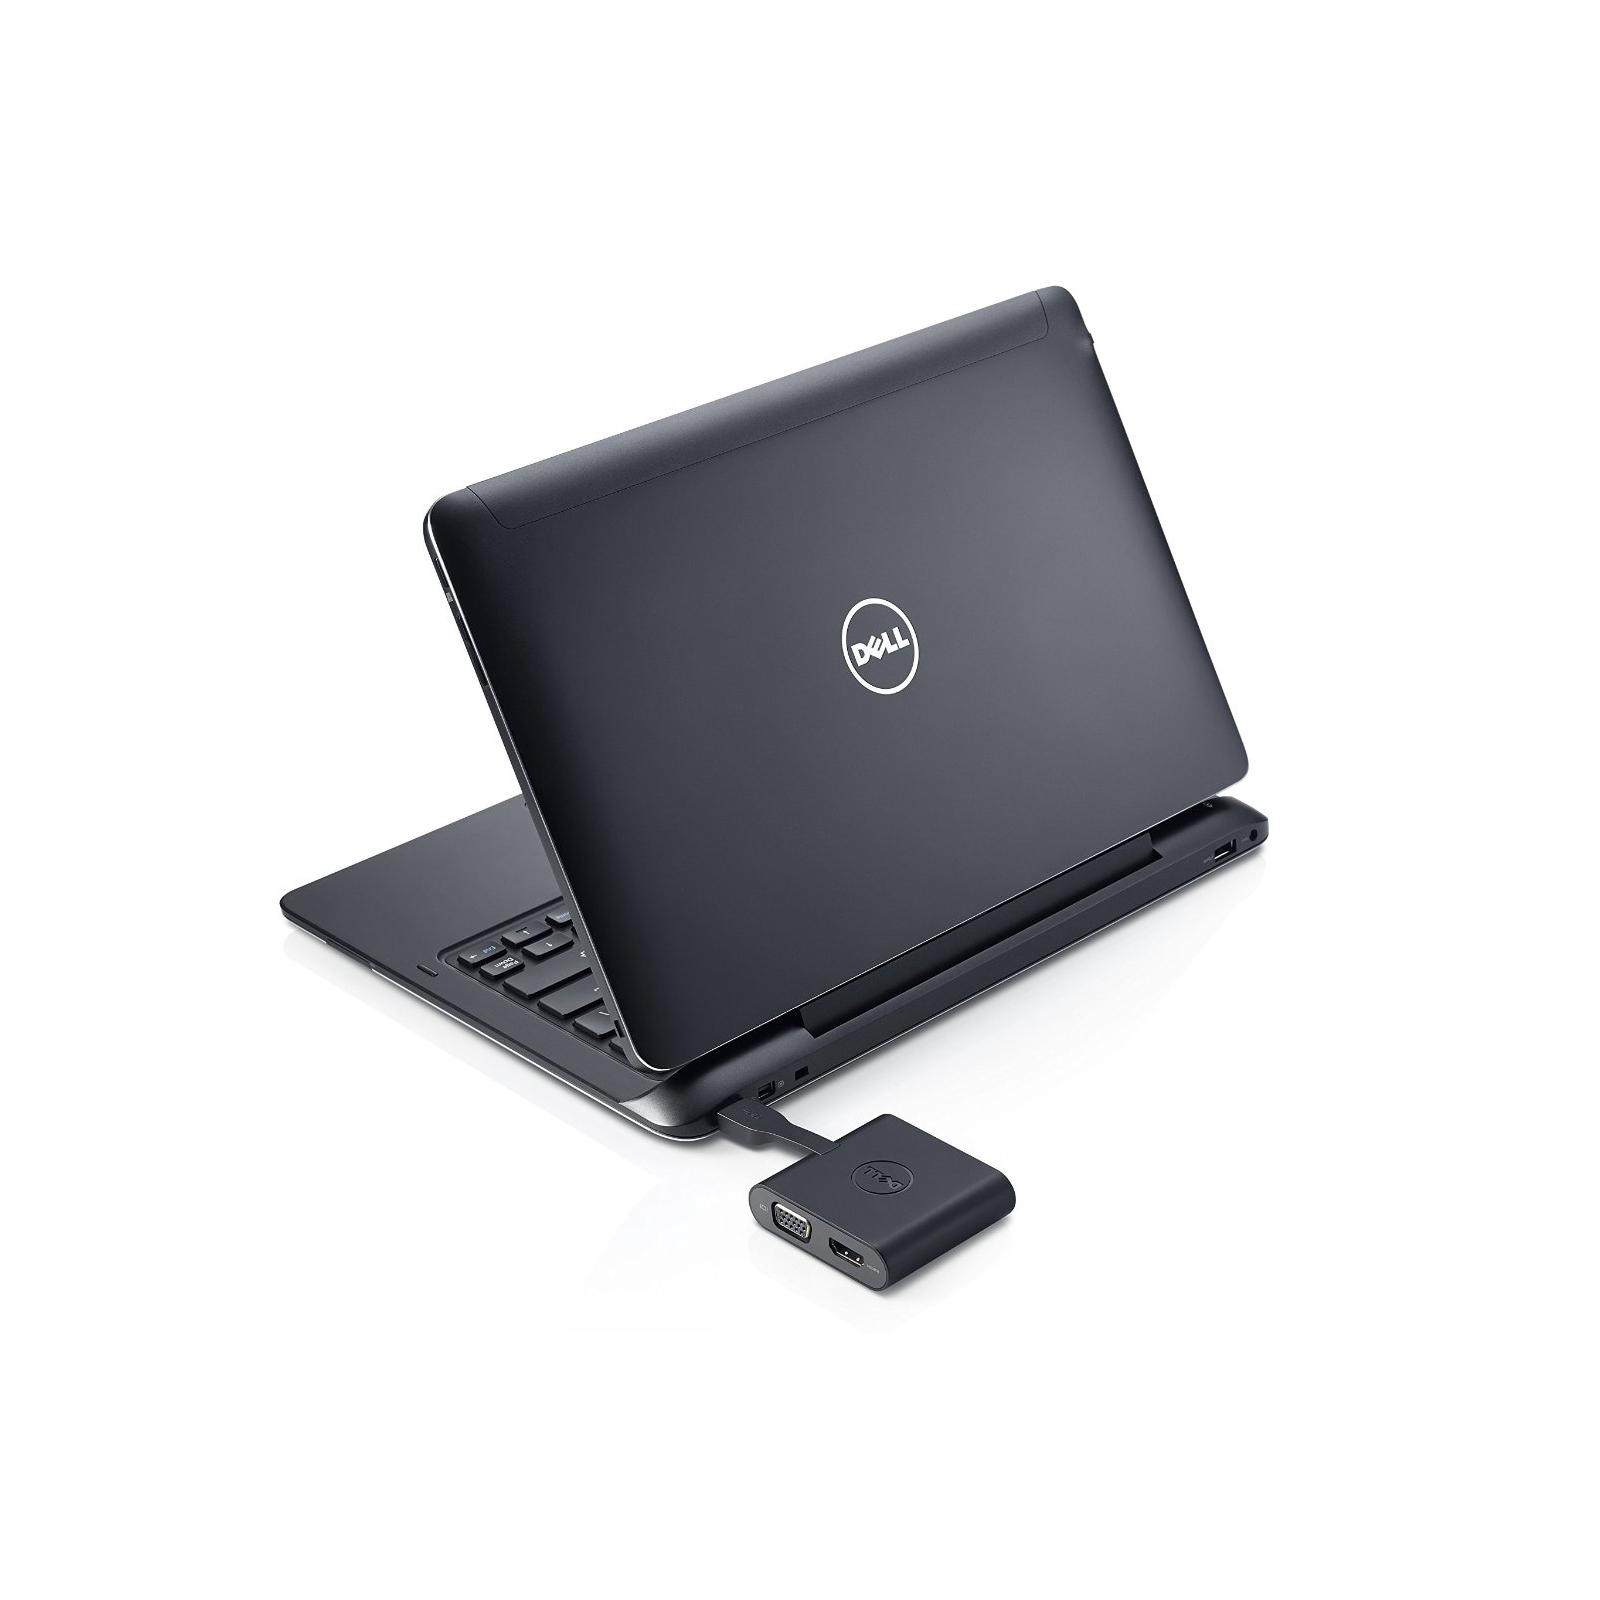 Док-станция Dell DA100 USB 3.0 to HDMI/VGA/Ethernet/USB 2.0 (492-BBNU) изображение 5